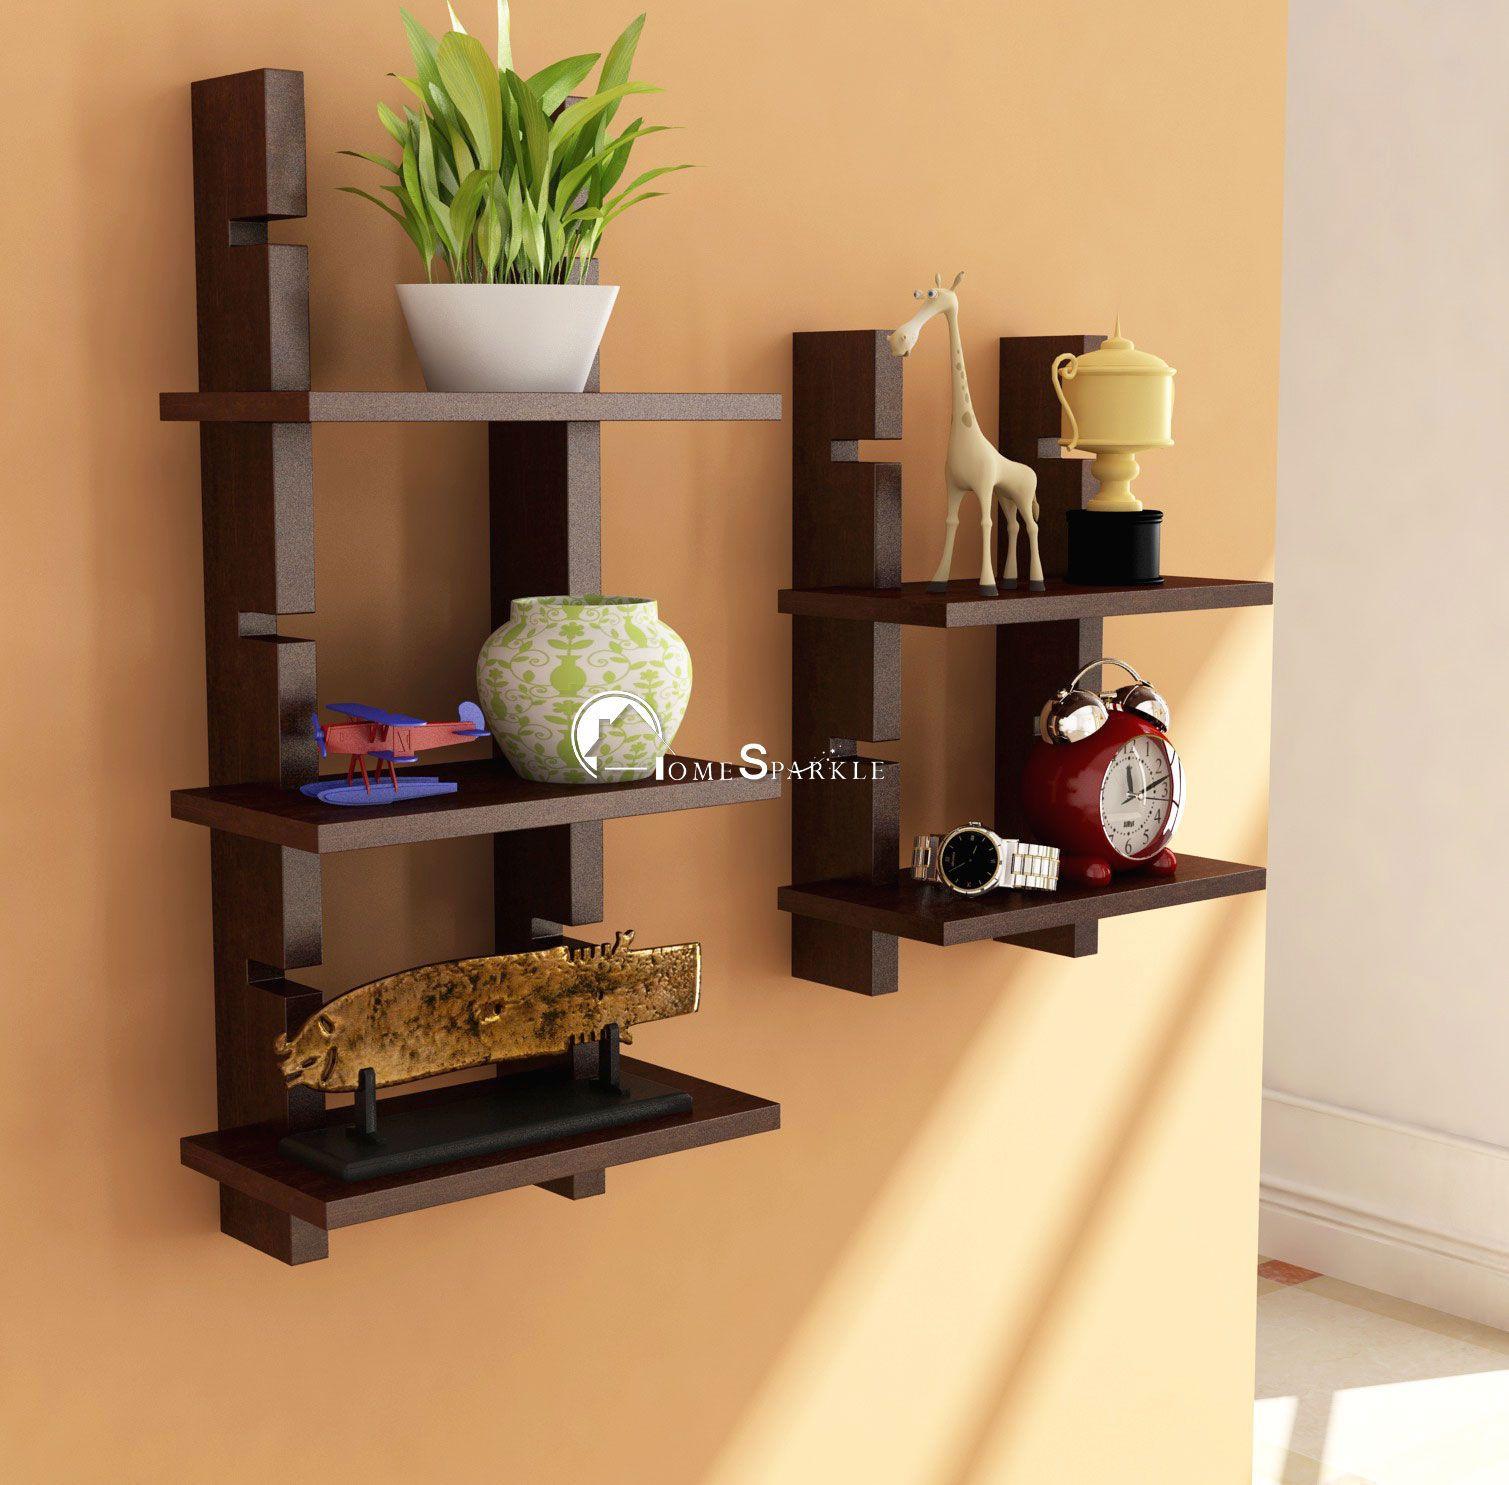 Home Sparkle MDF Ladder Shelf For Wall Décor -Suitable For Living Room/Bed Room (Designed By Craftsman)